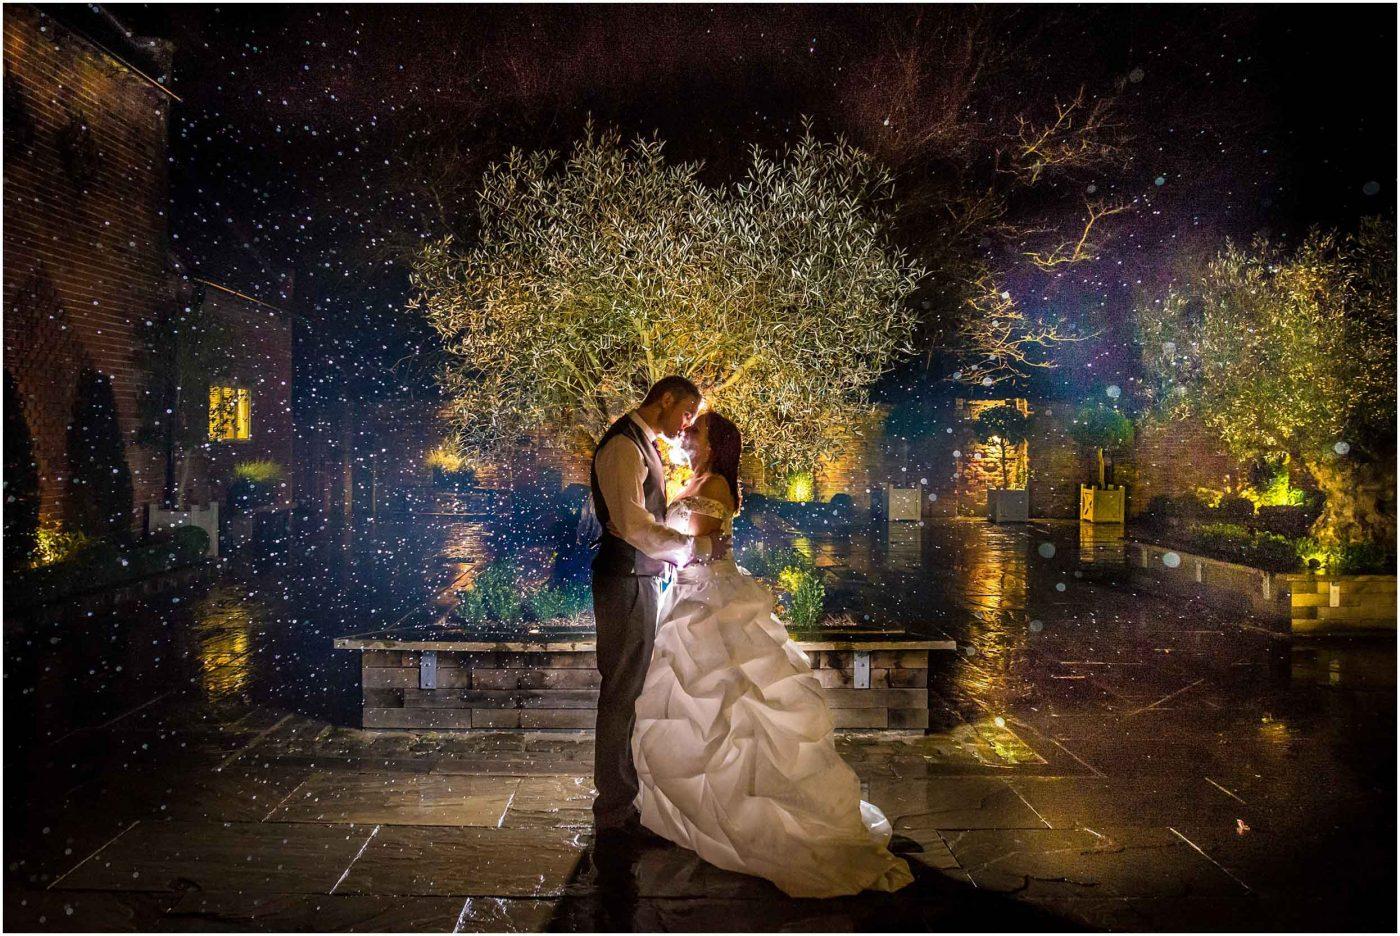 Wedding Photography by Damian Burcher